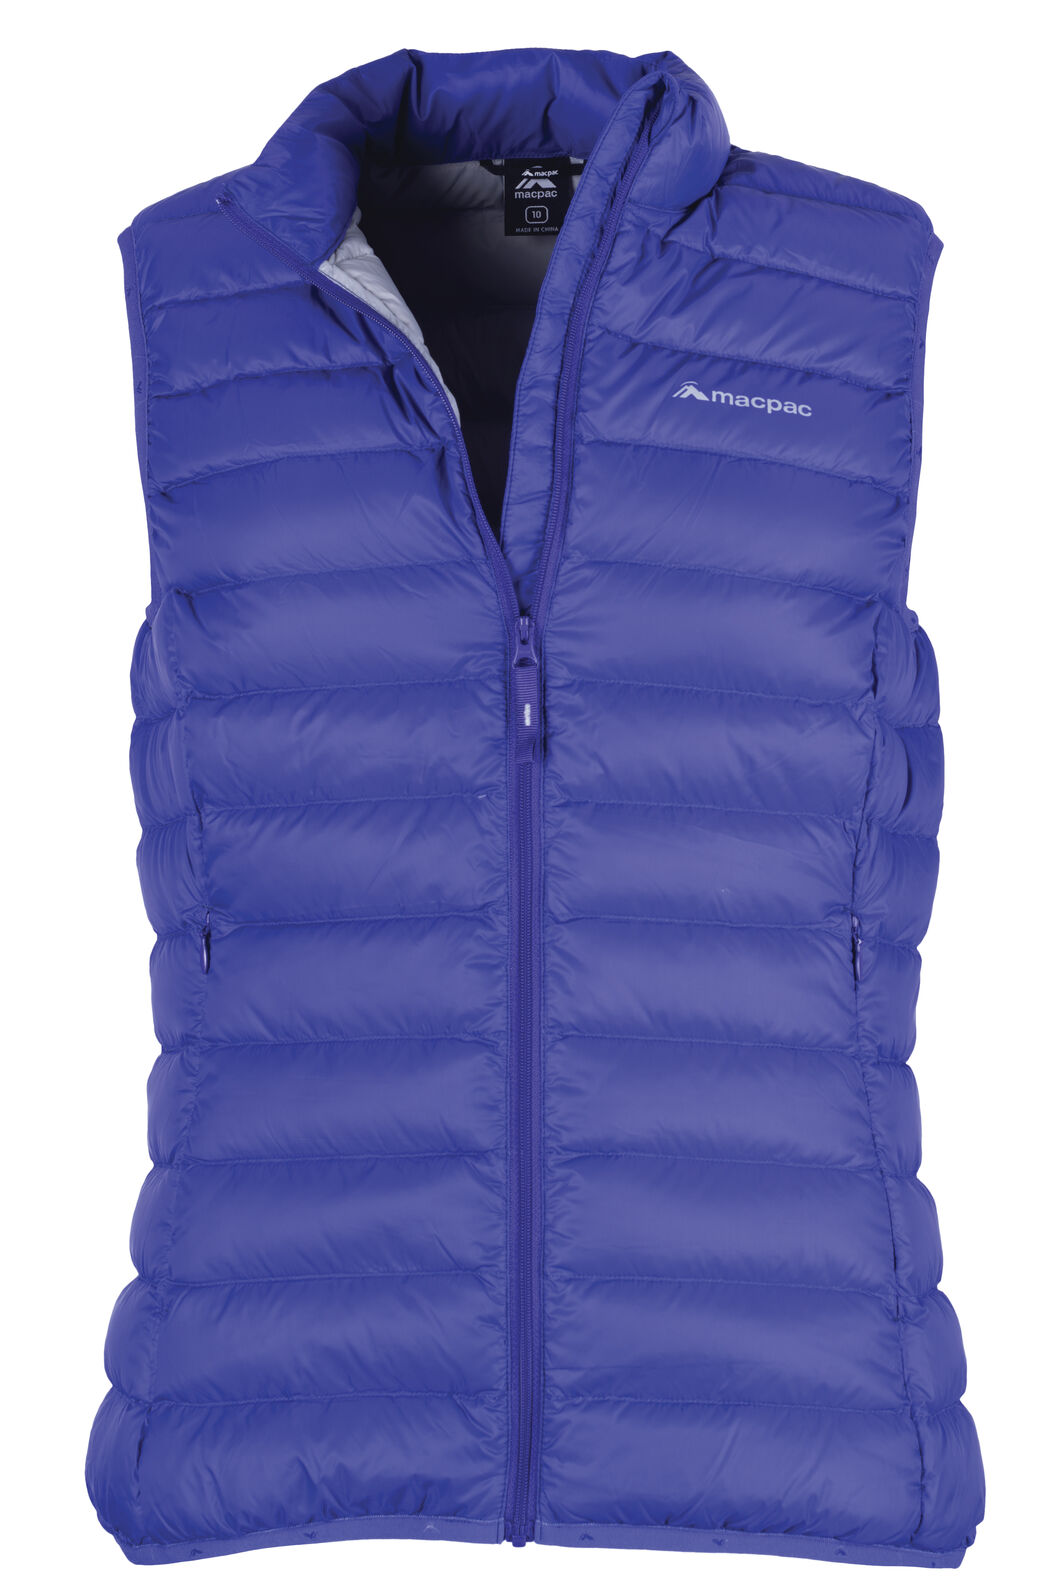 Macpac Uber Light Down Vest — Women's, Deep Blue, hi-res